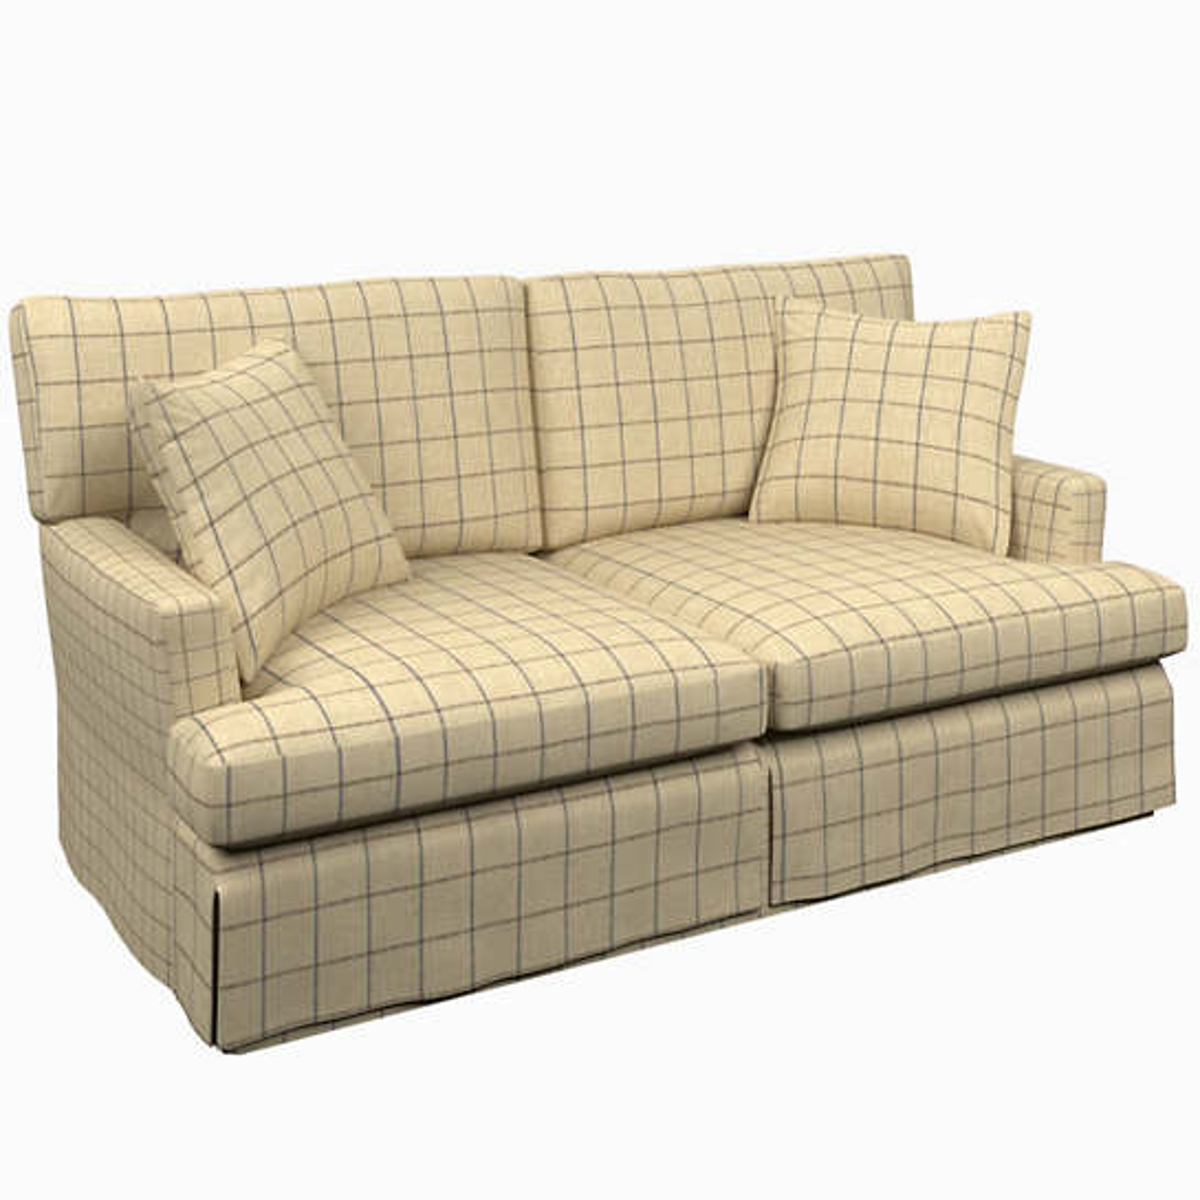 Chatham Tattersall Navy/Brown Saybrook 2 Seater Slipcovered Sofa